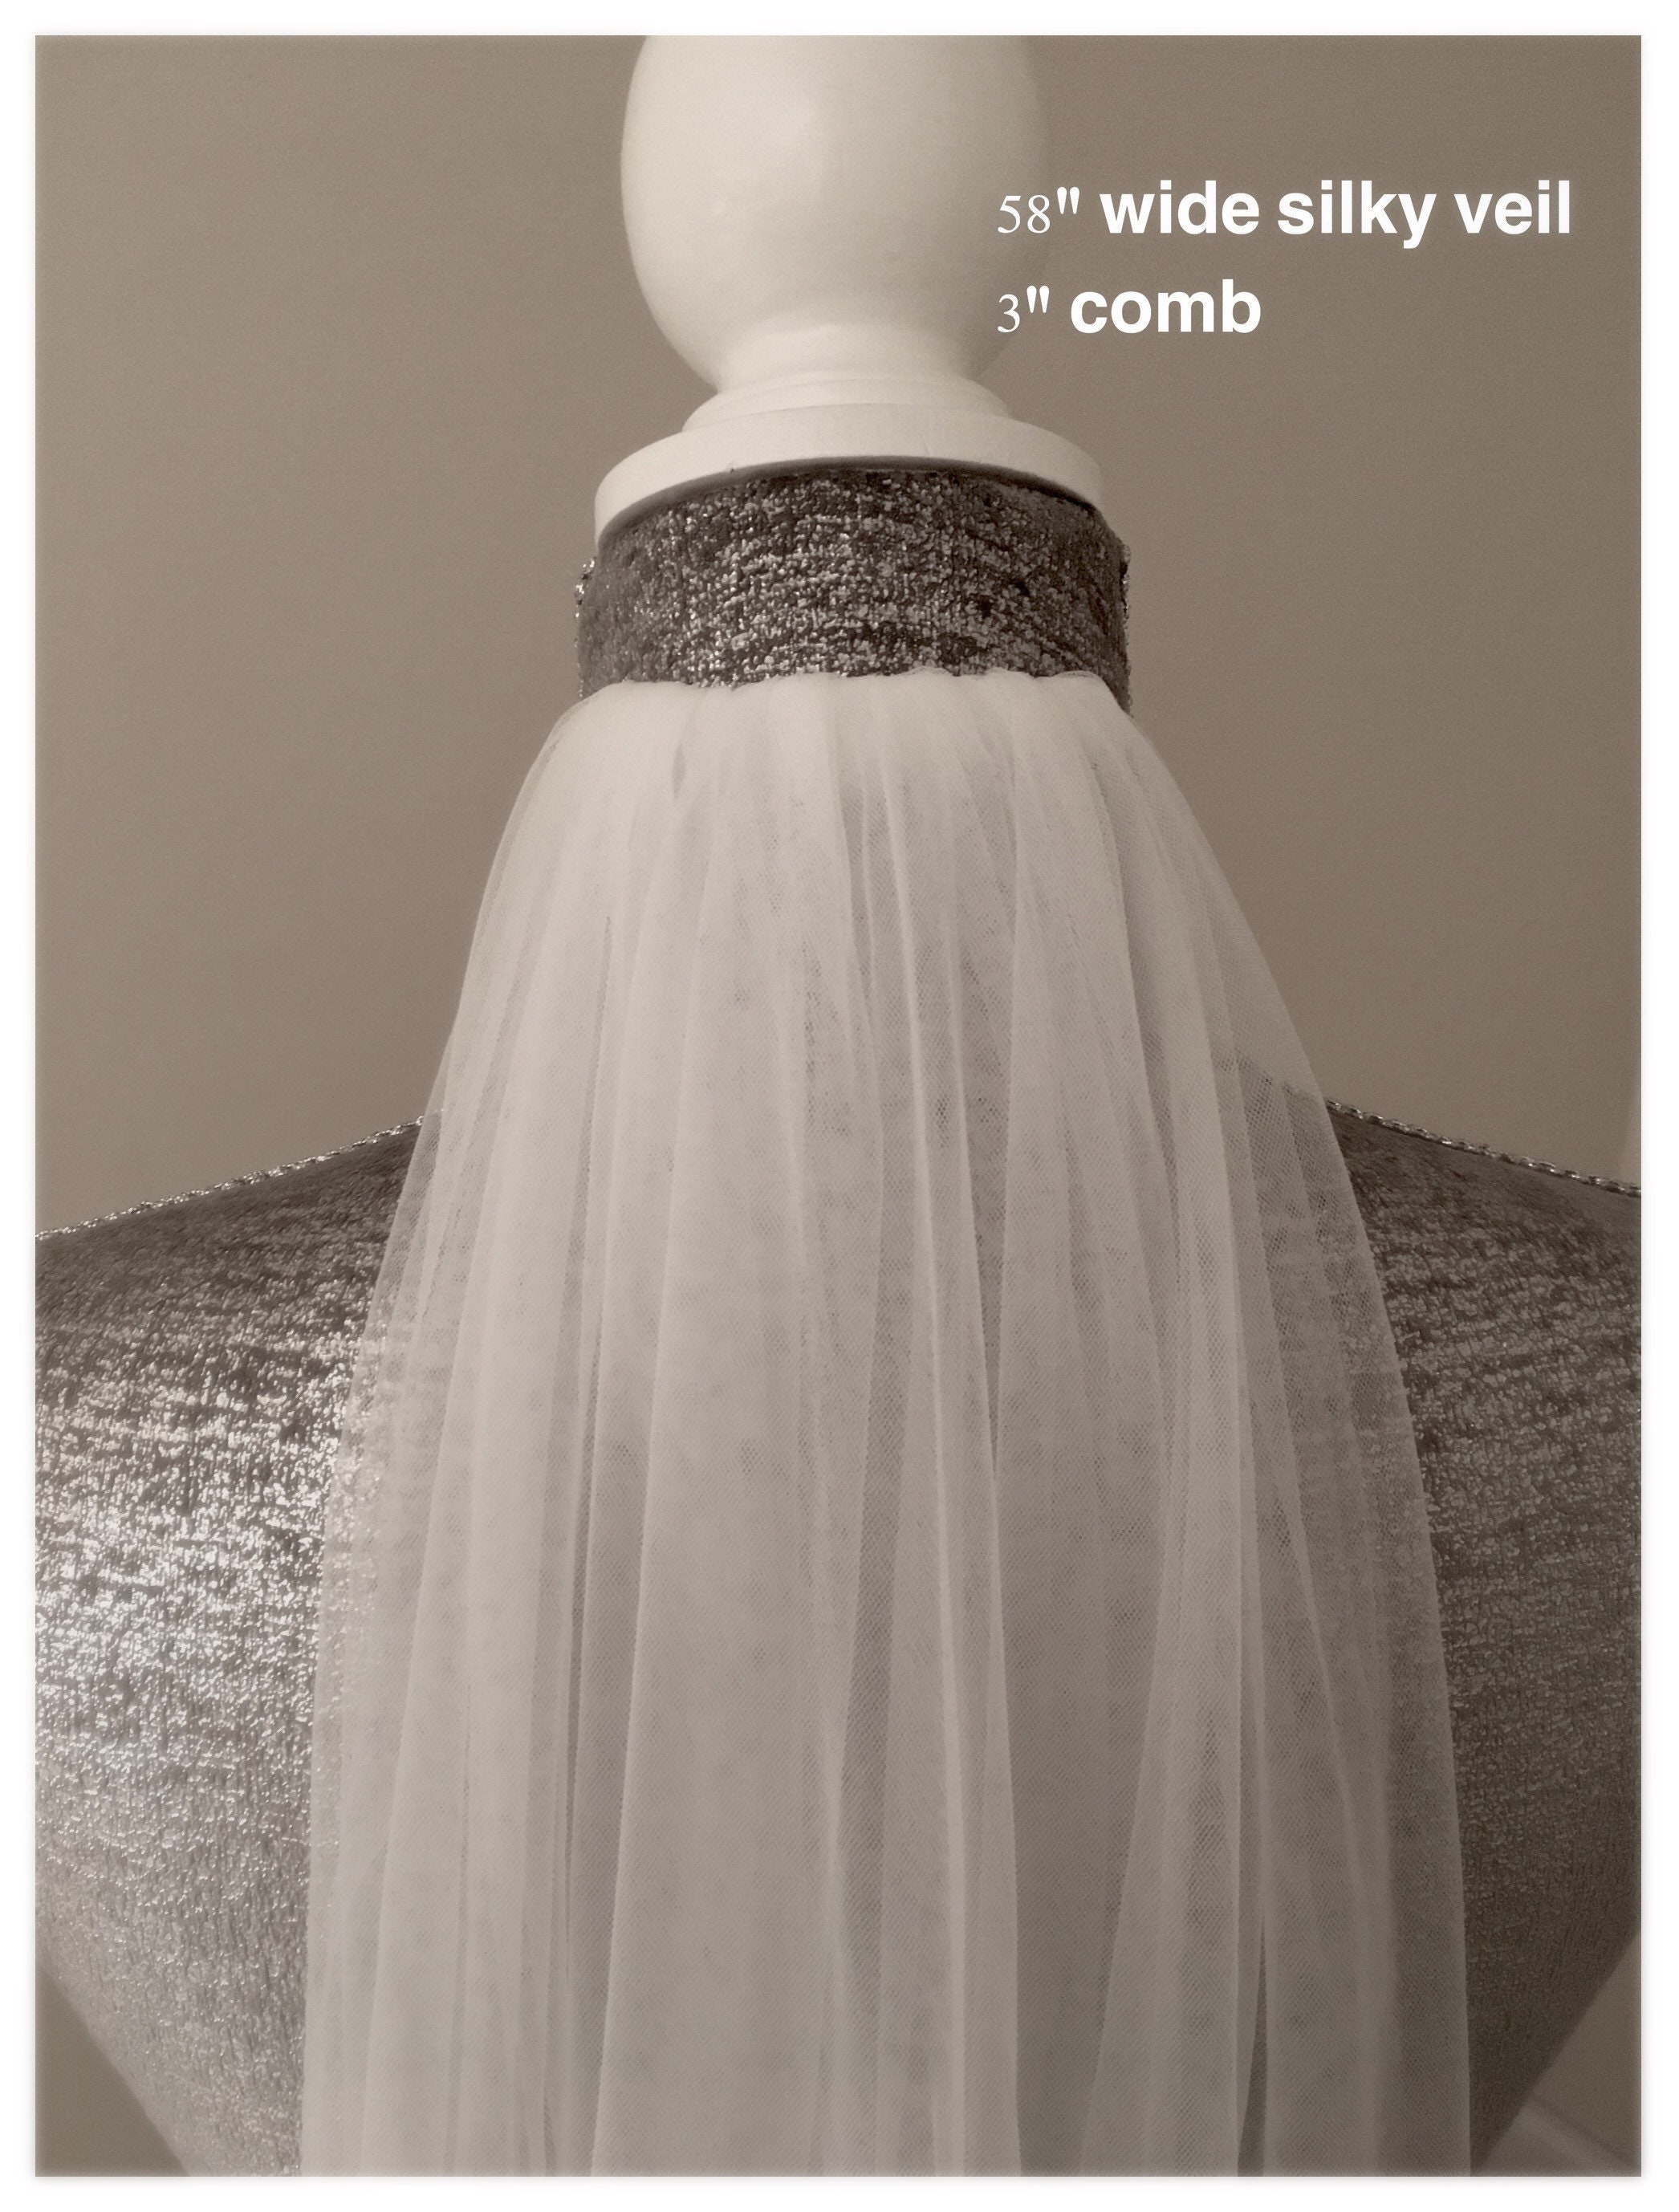 1 Tier Chapel Floor Length Veil Bridal Wedding Cut Romantic Edge Ivory//White UK